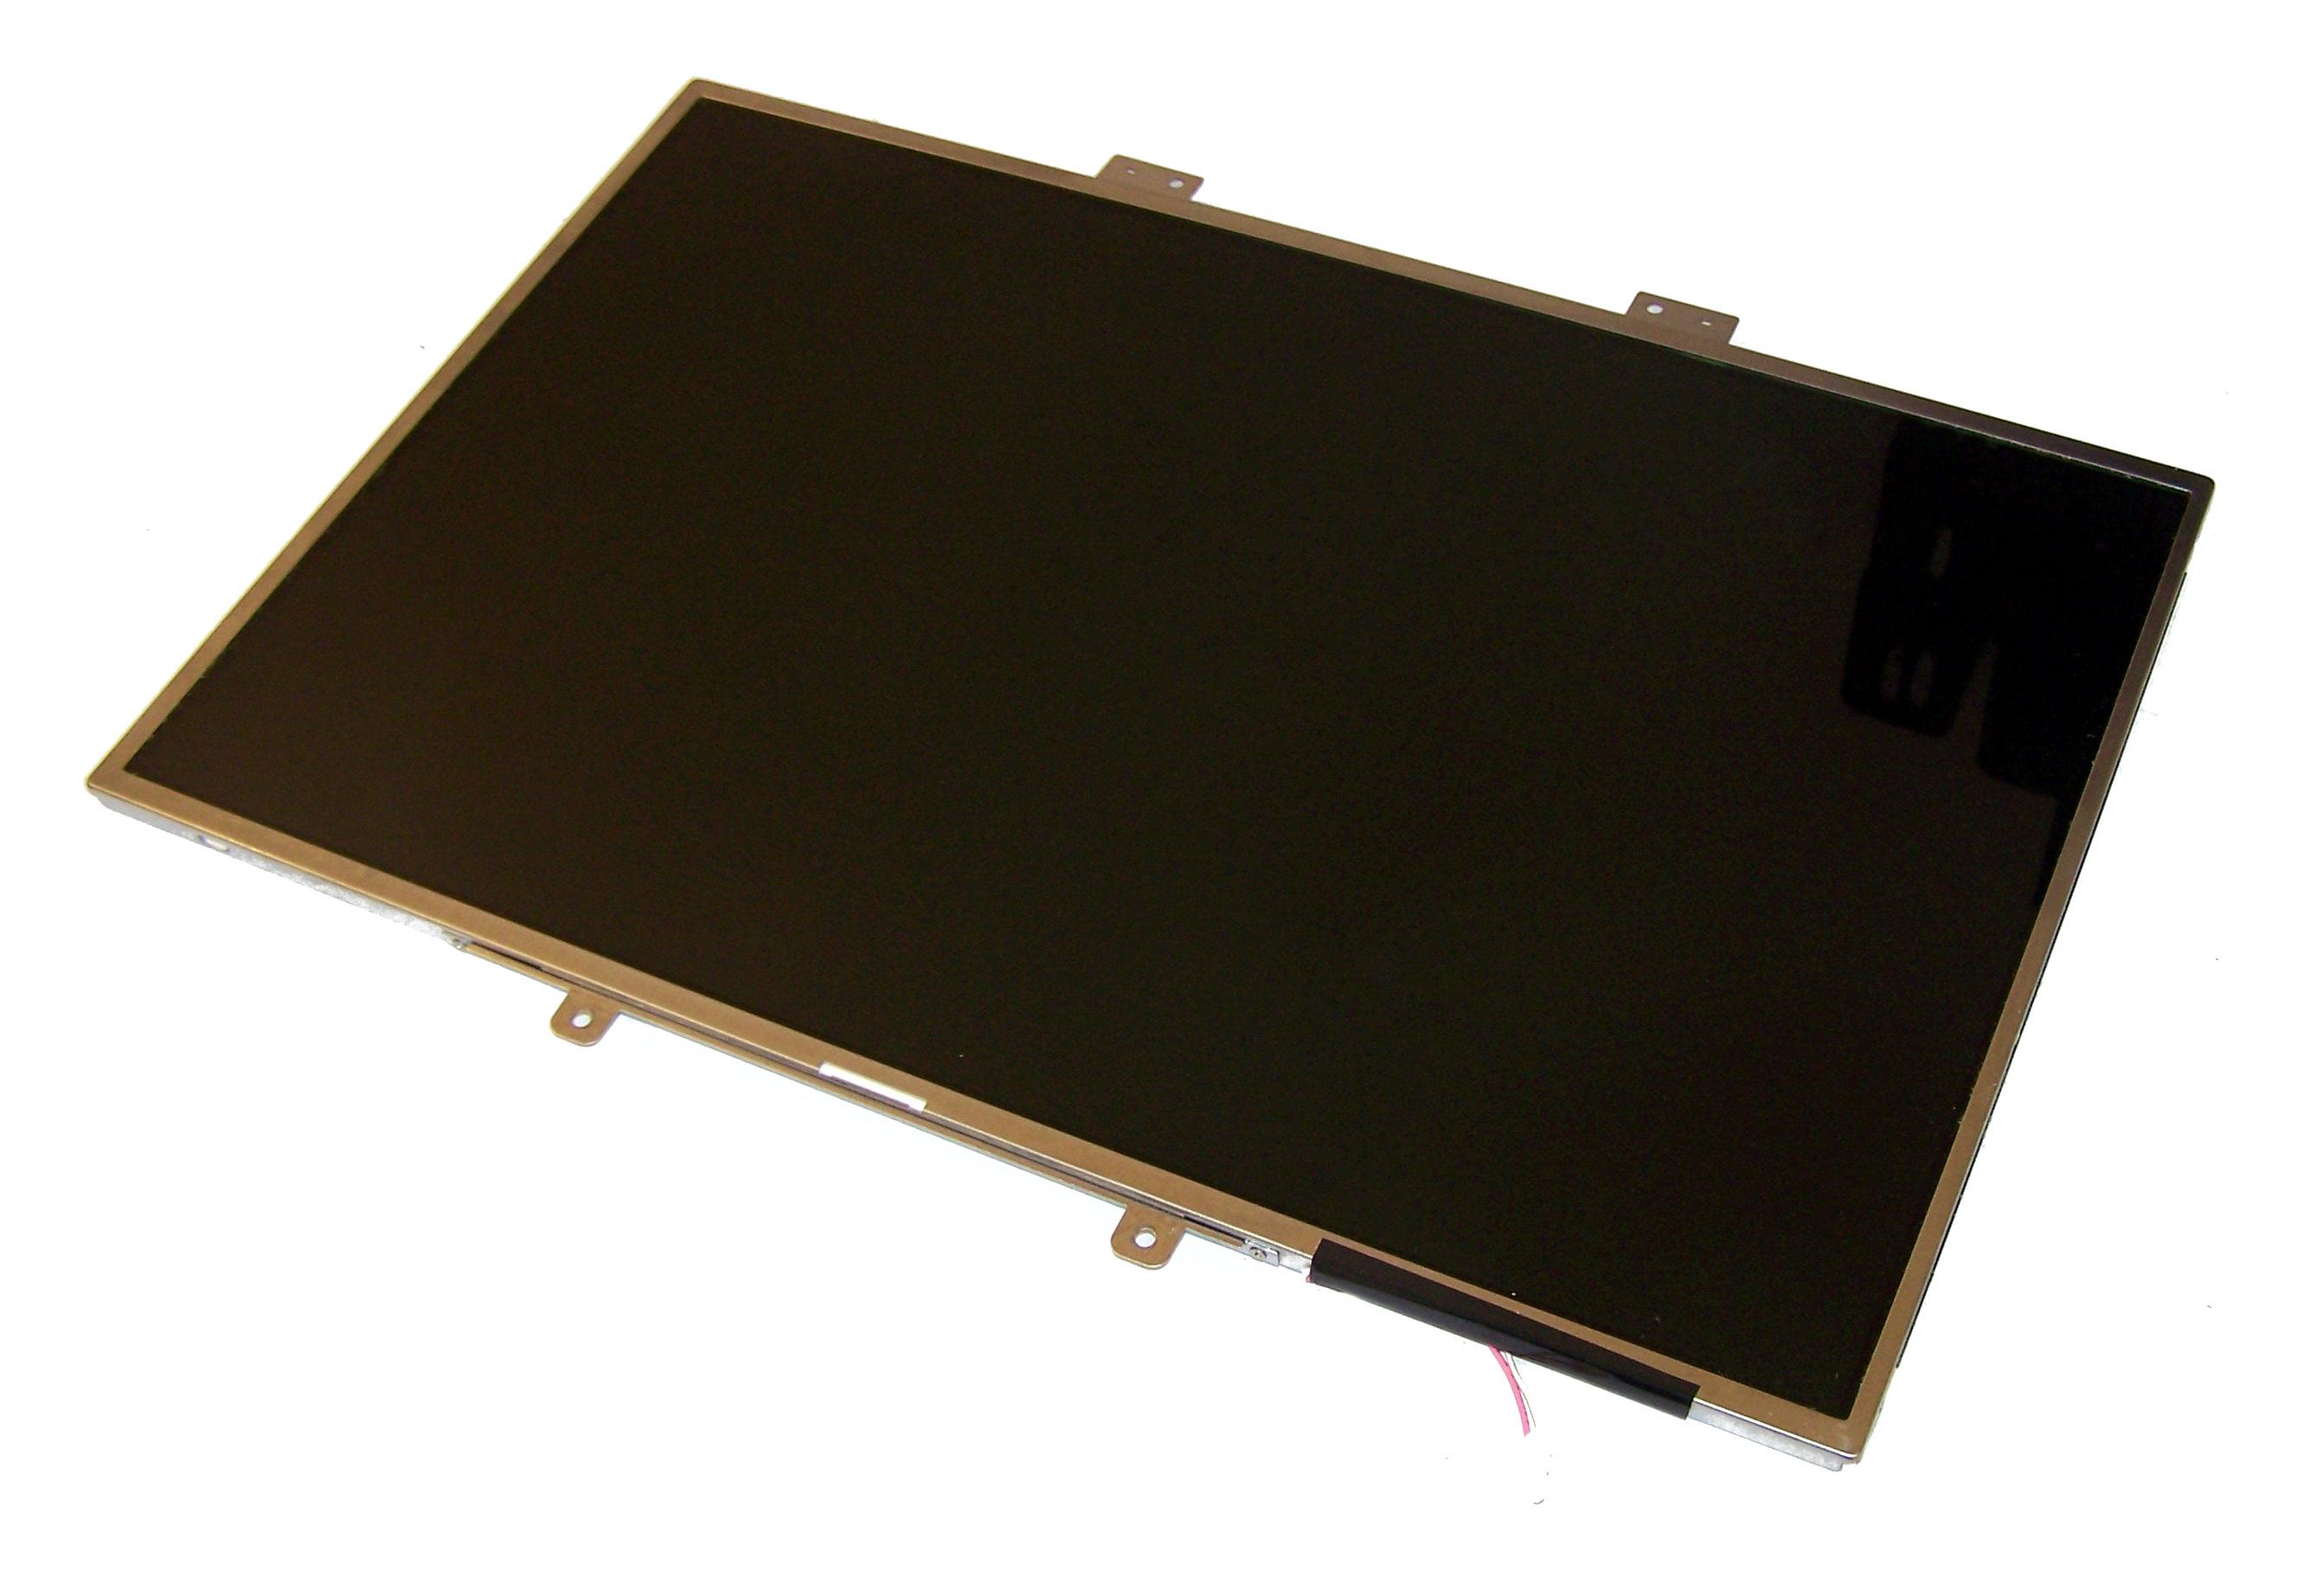 "Chunghwa CLAA154WB05A 15.4"" WXGA 1280x800 Gloss LCD CCFL TFT Panel"